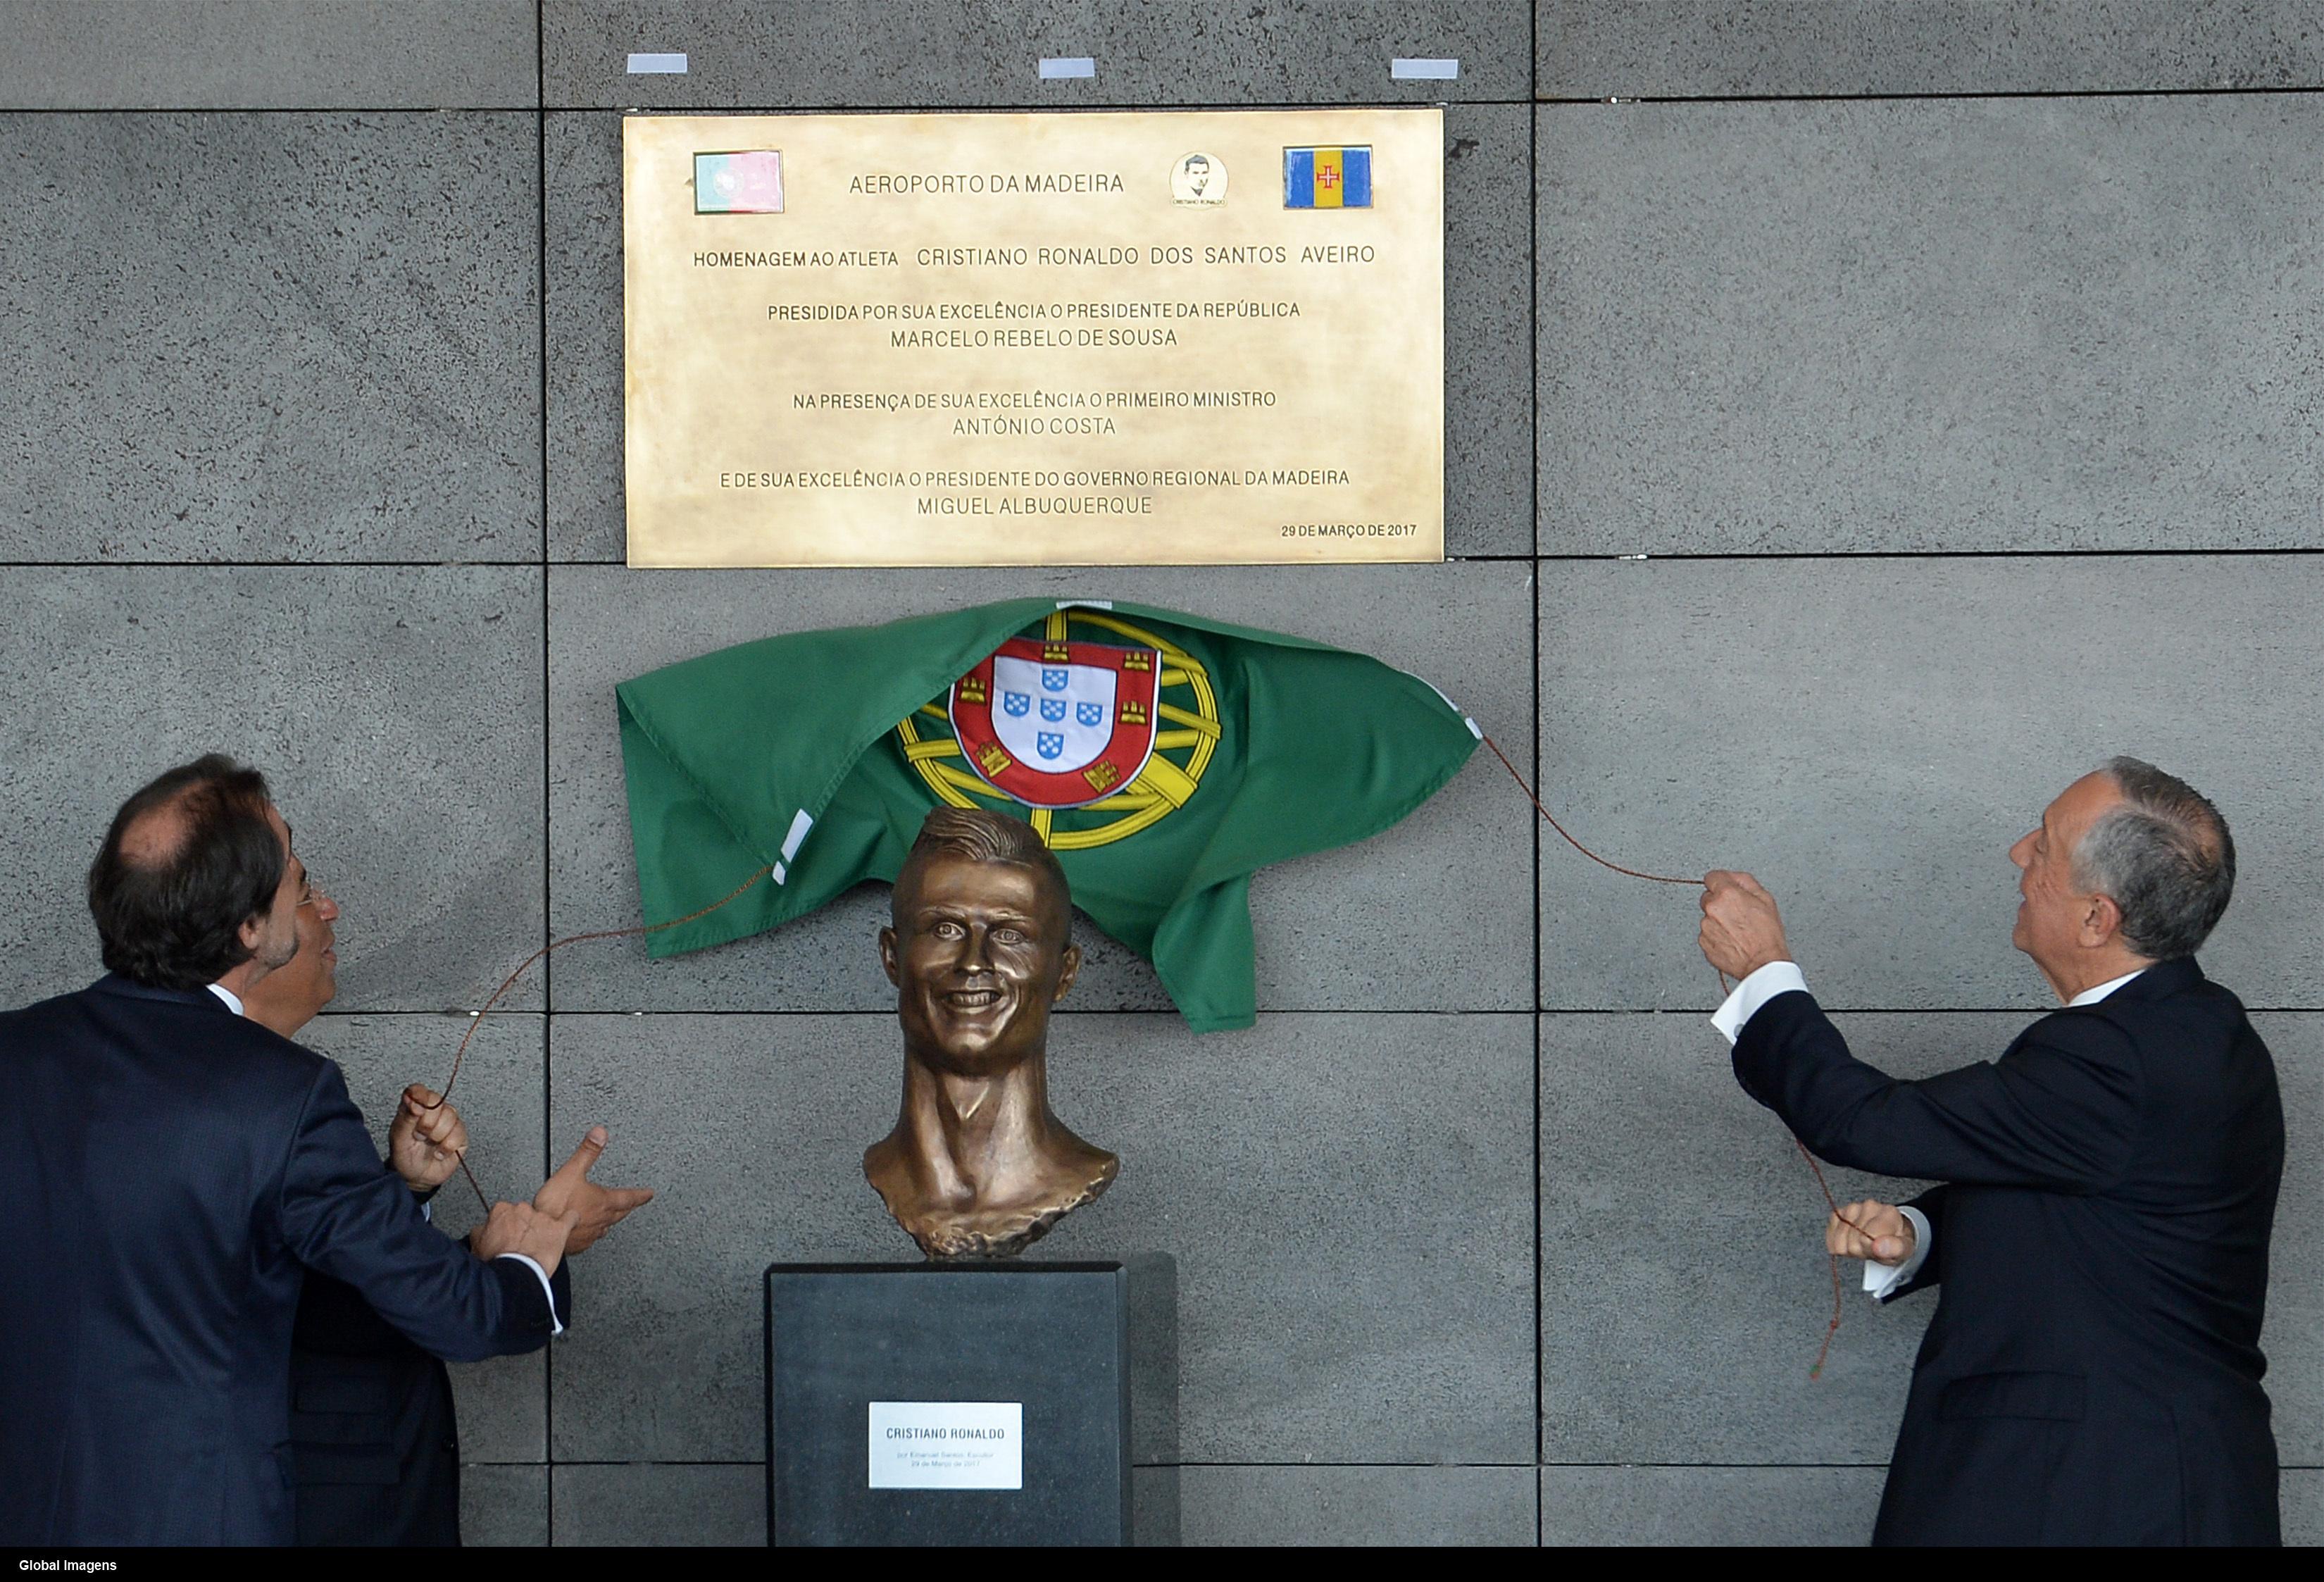 Cristiano Ronaldo's new bust actually resembles Cristiano Ronaldo